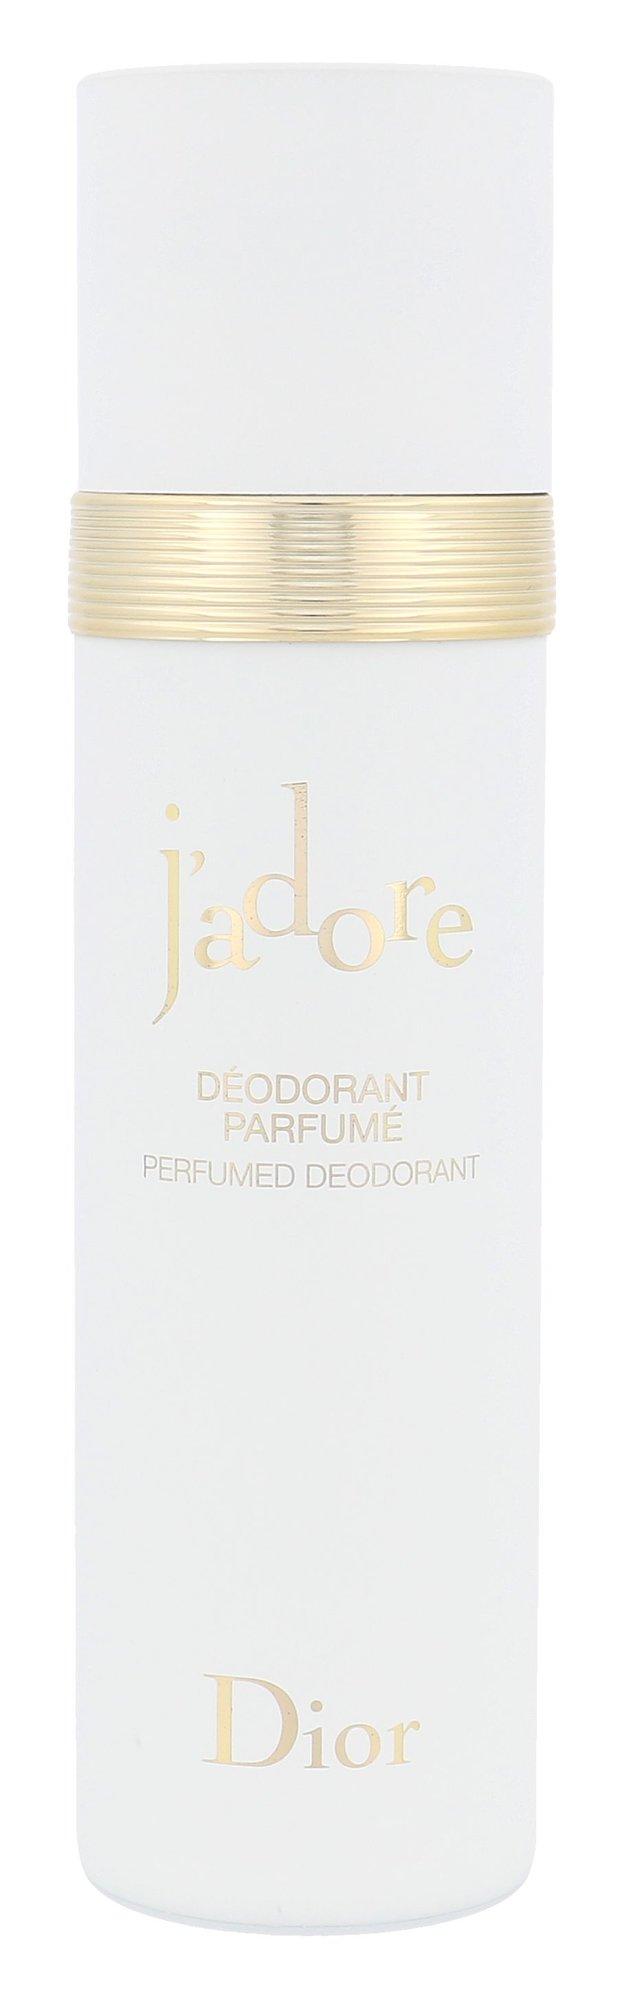 Christian Dior J´adore Deodorant 100ml